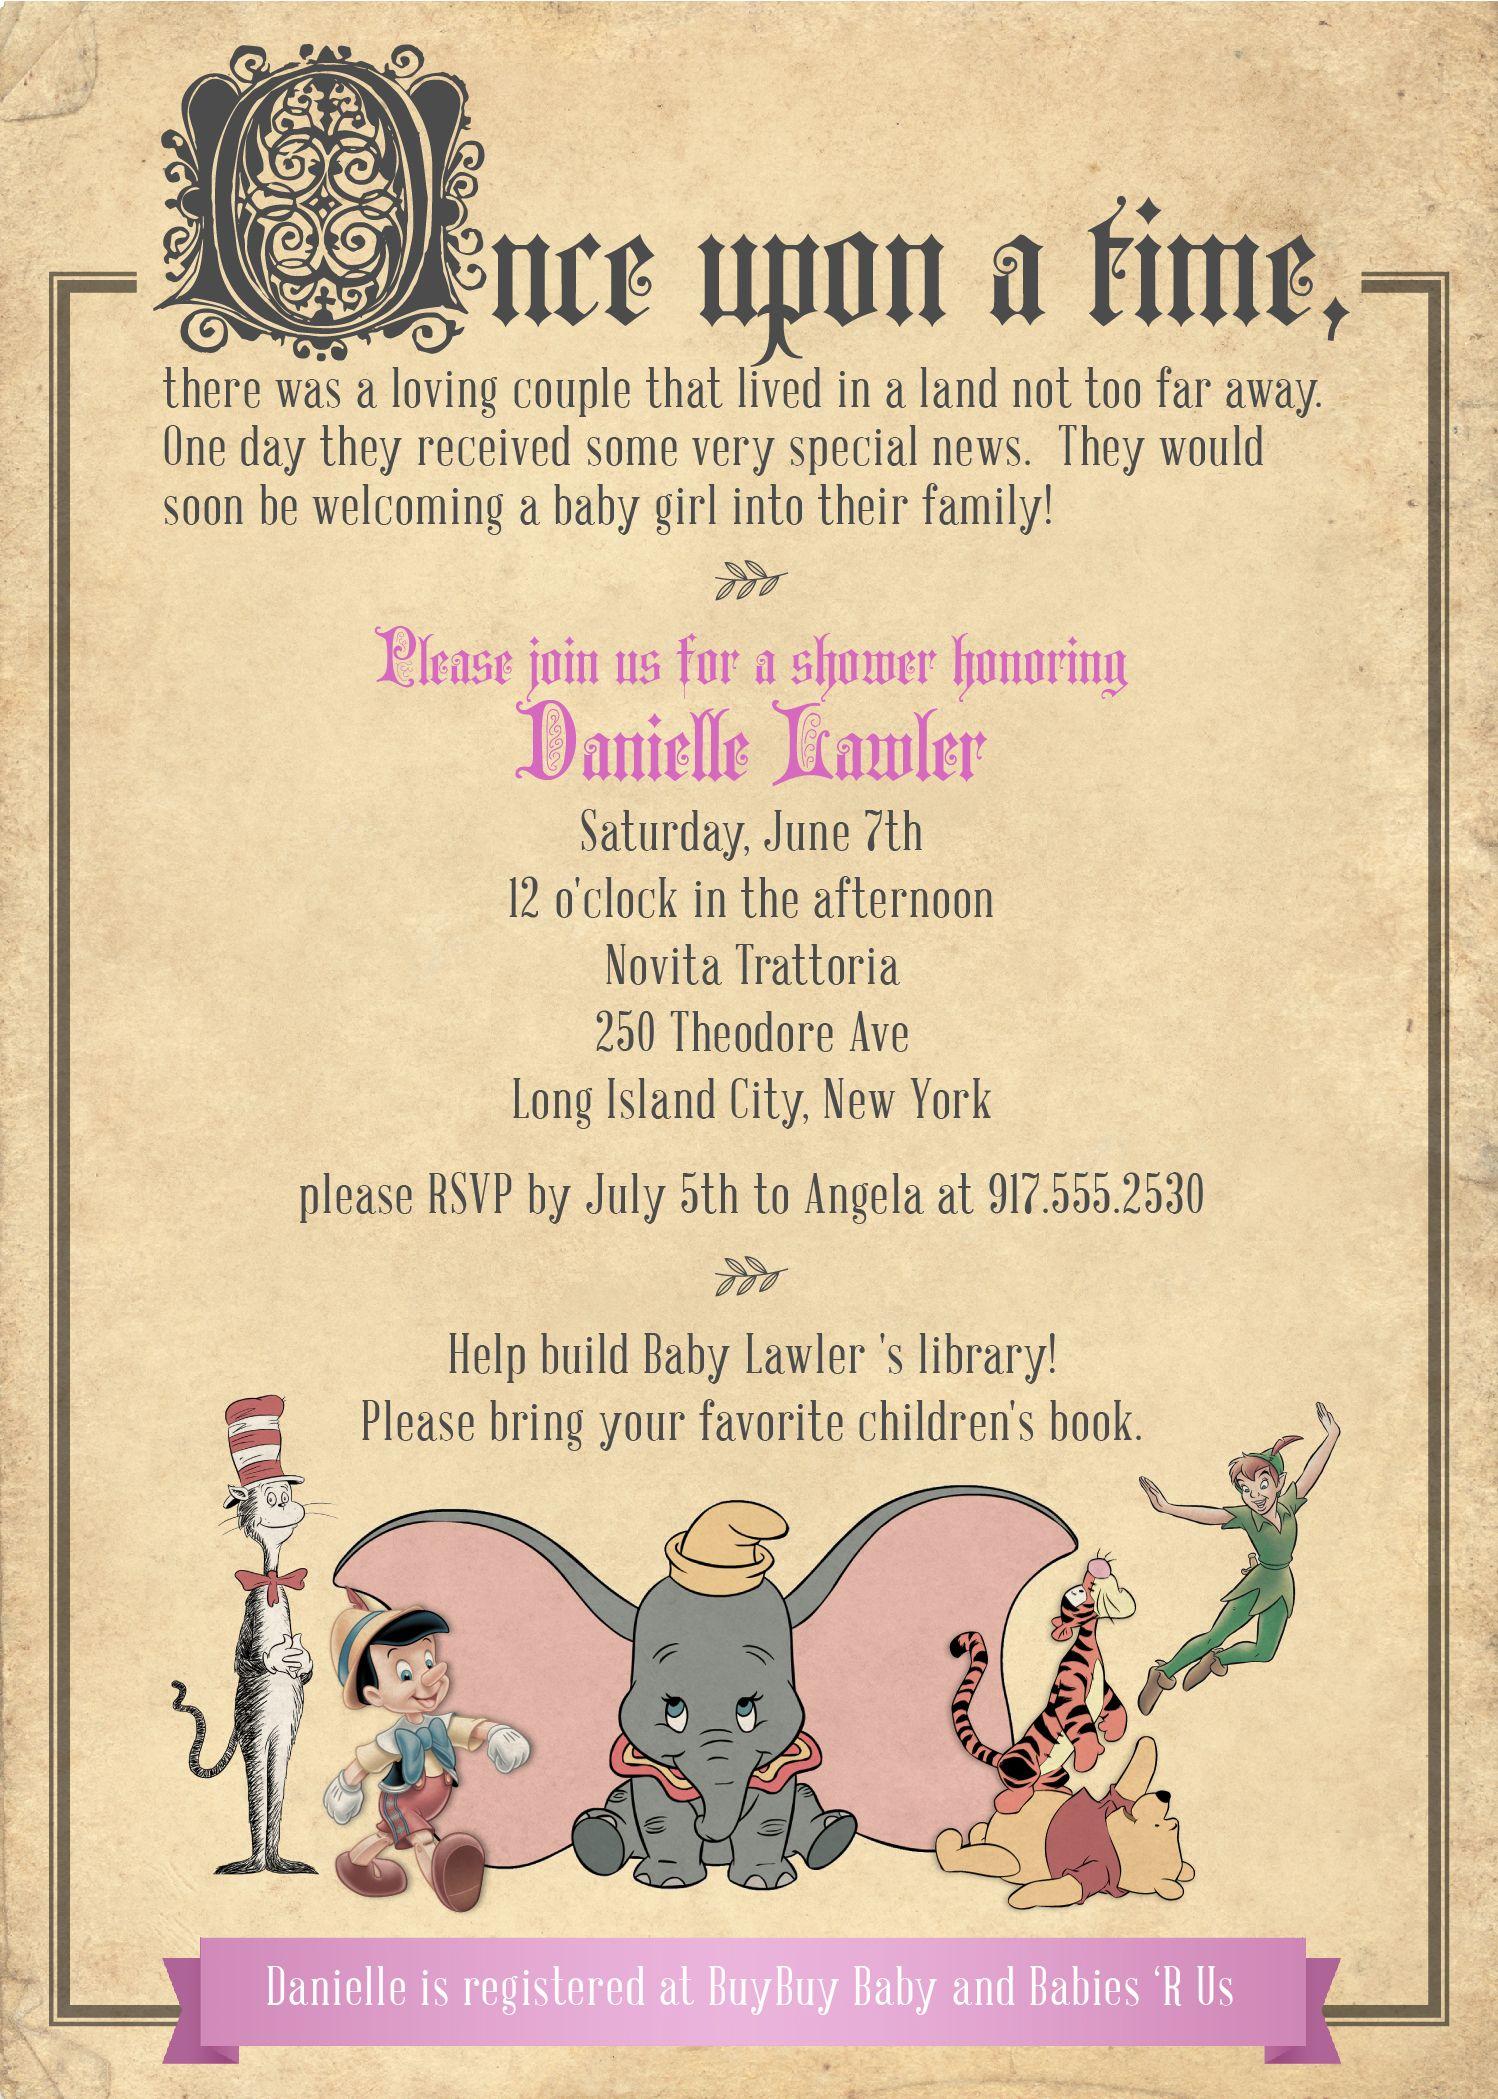 baby shower invitation for a storybook fairytale theme | random ...